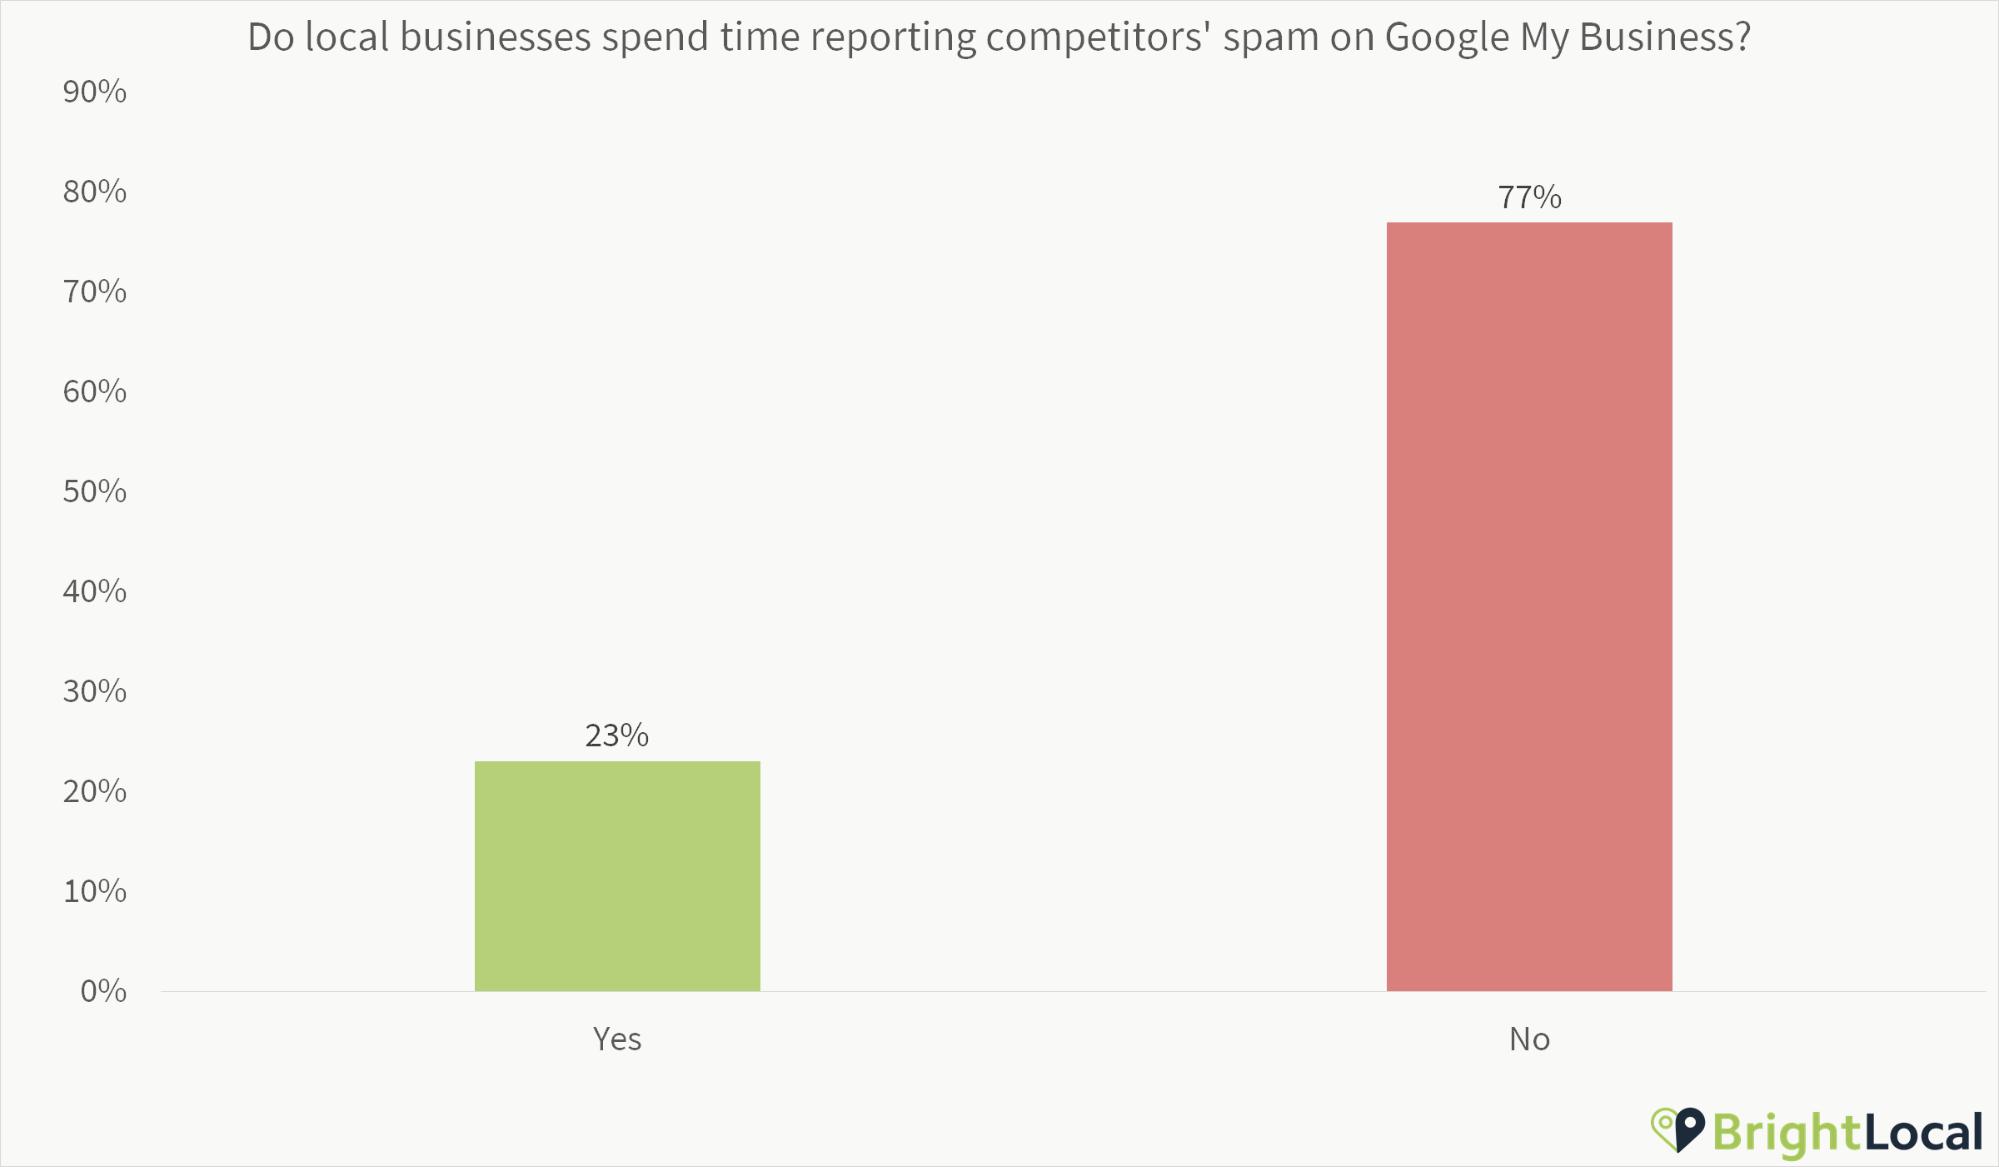 Do local businesses report spam?